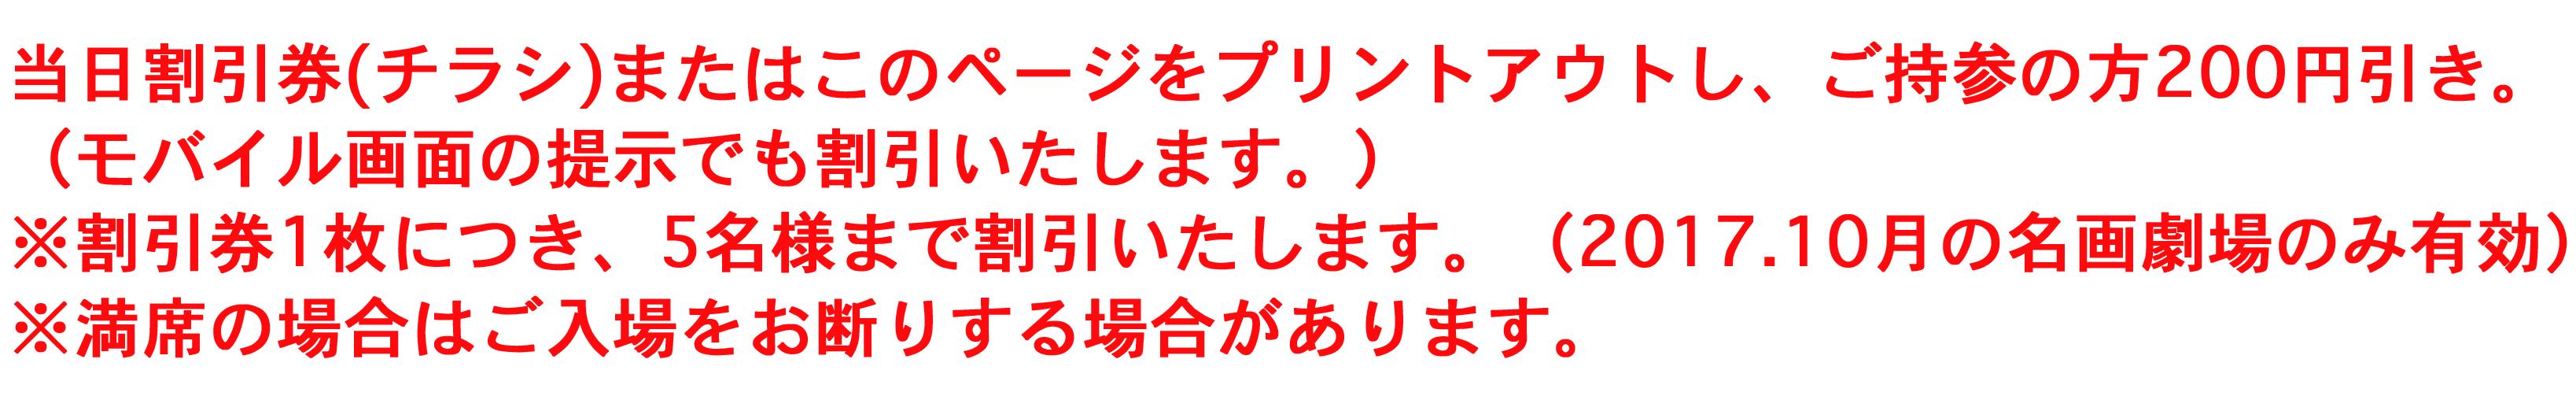 http://www.suncityhall.jp/10%E6%9C%88%E5%89%B2%E5%BC%95.jpg